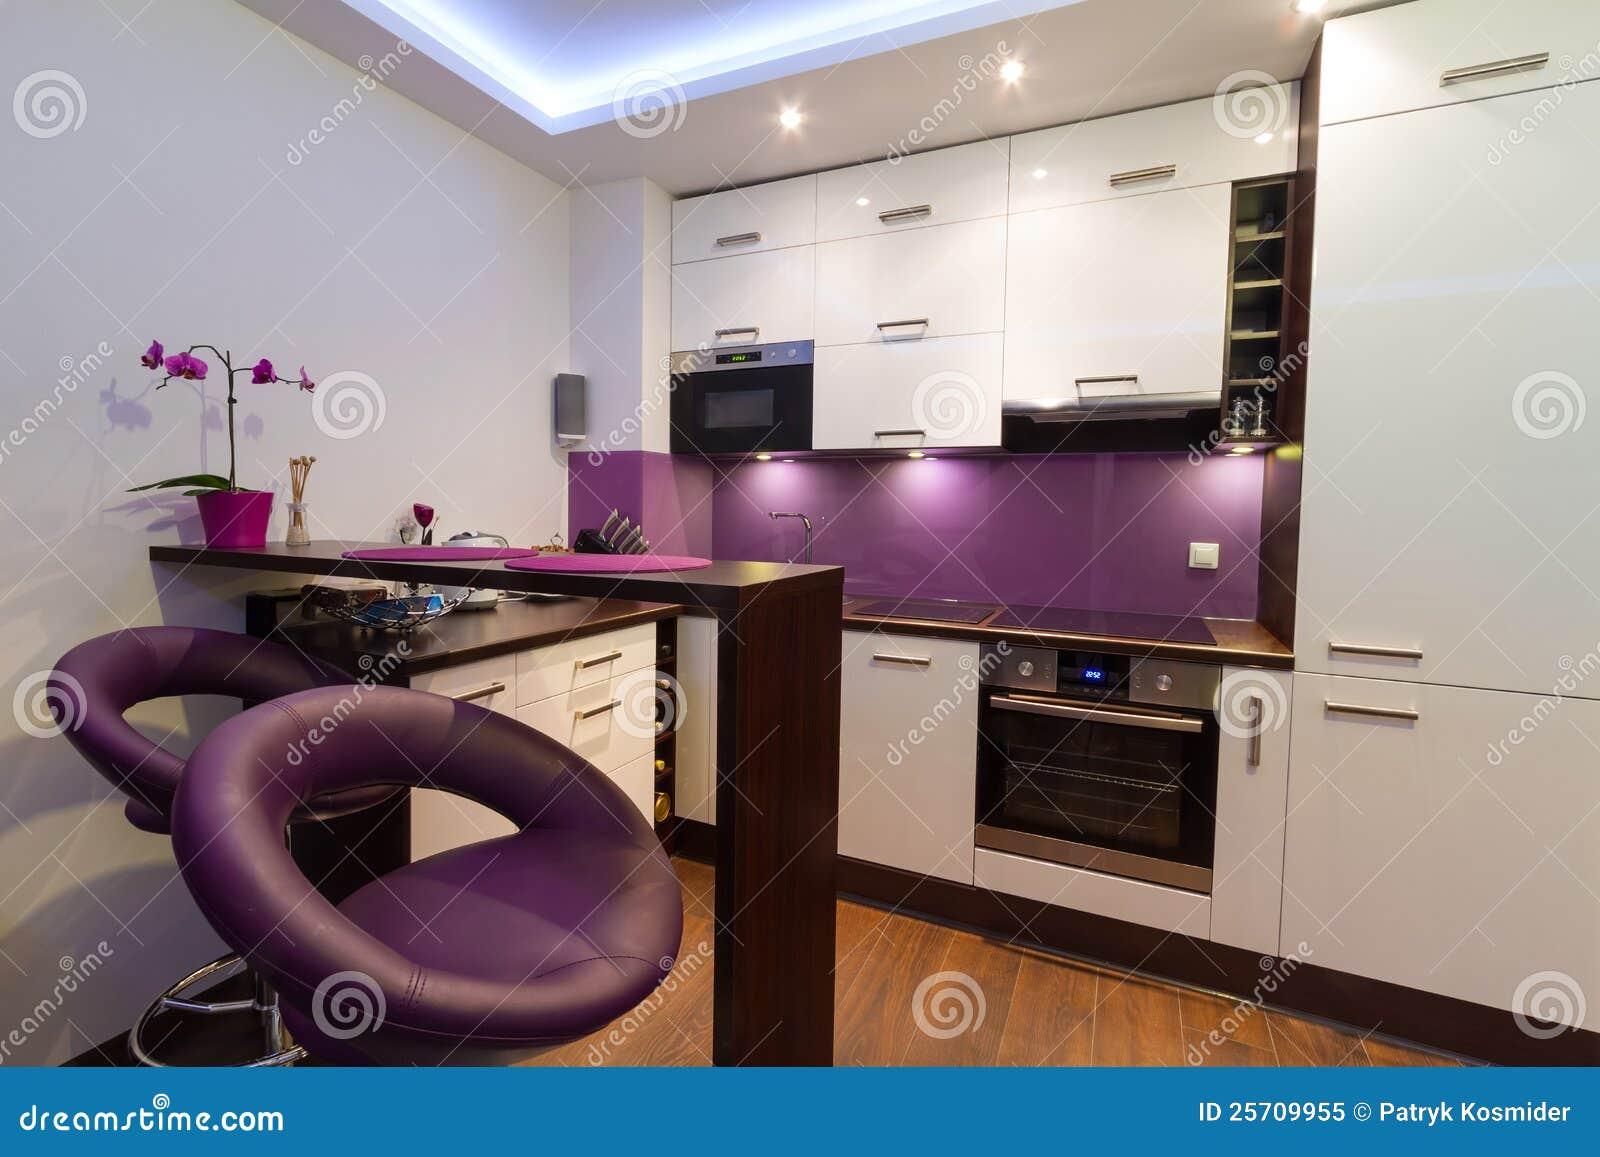 cucina moderna usata lombardia: laccata bianca con isolajpg ... - Cucina Moderna Usata